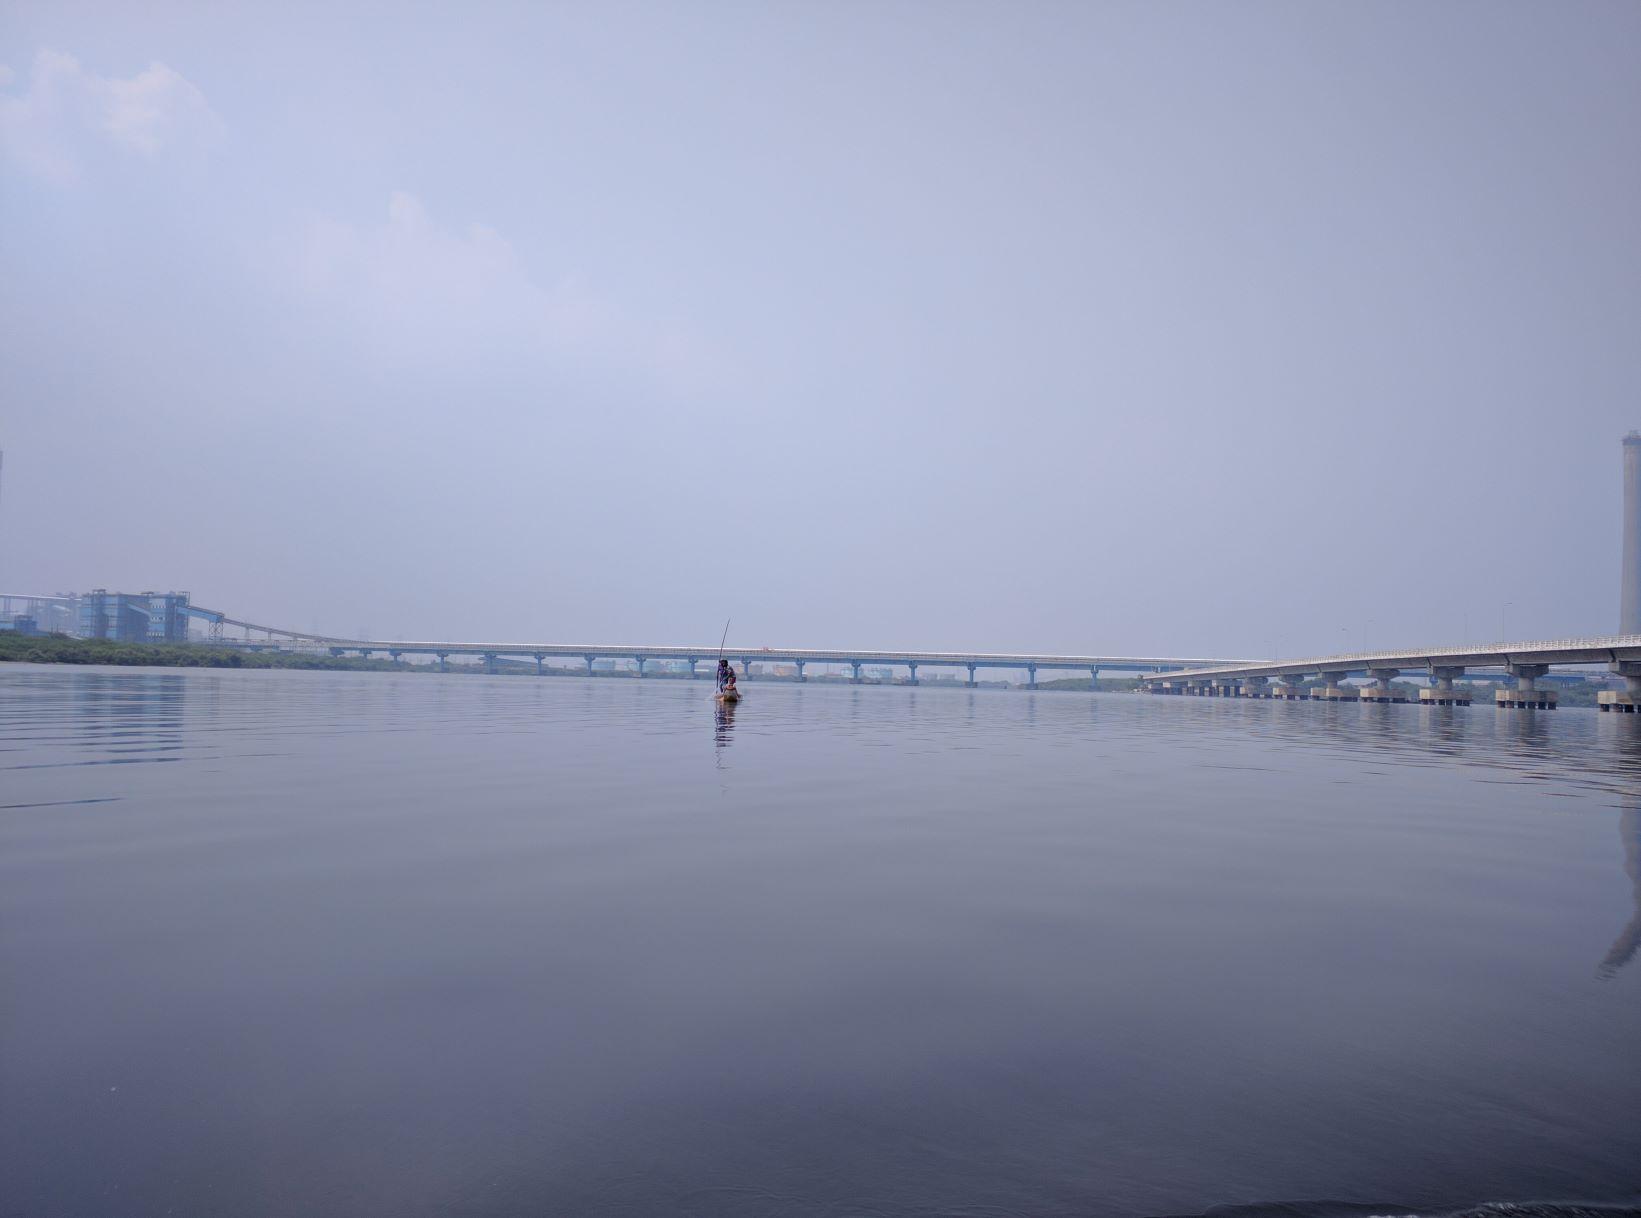 https://mk0itemsssrcorgqb419.kinstacdn.com/wp-content/uploads/2021/02/govindan-image-2.png